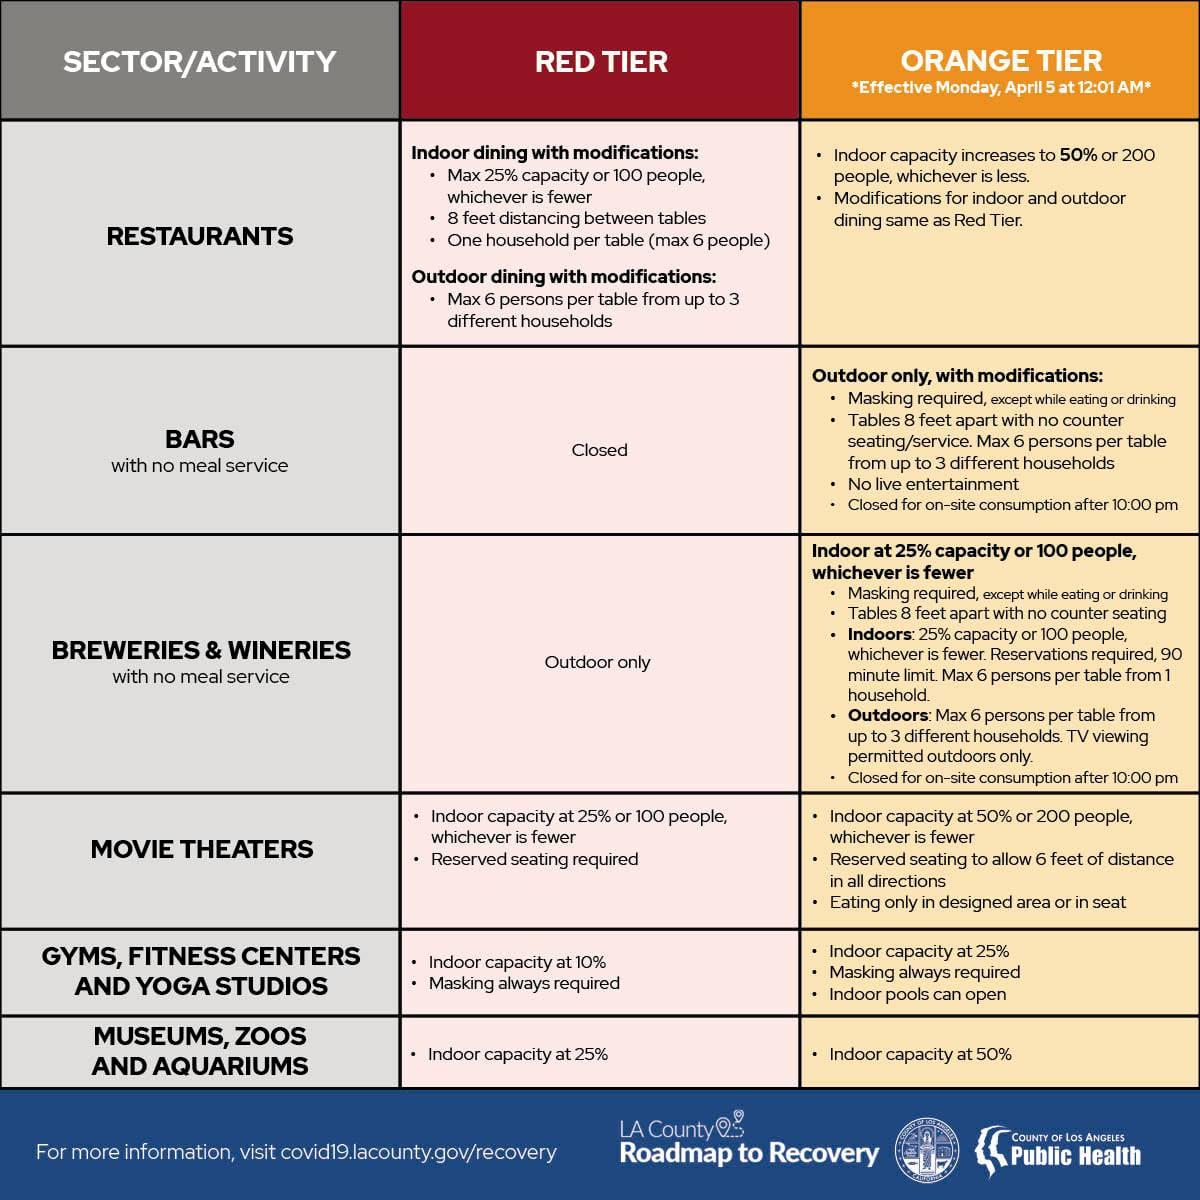 orange tier guidelines